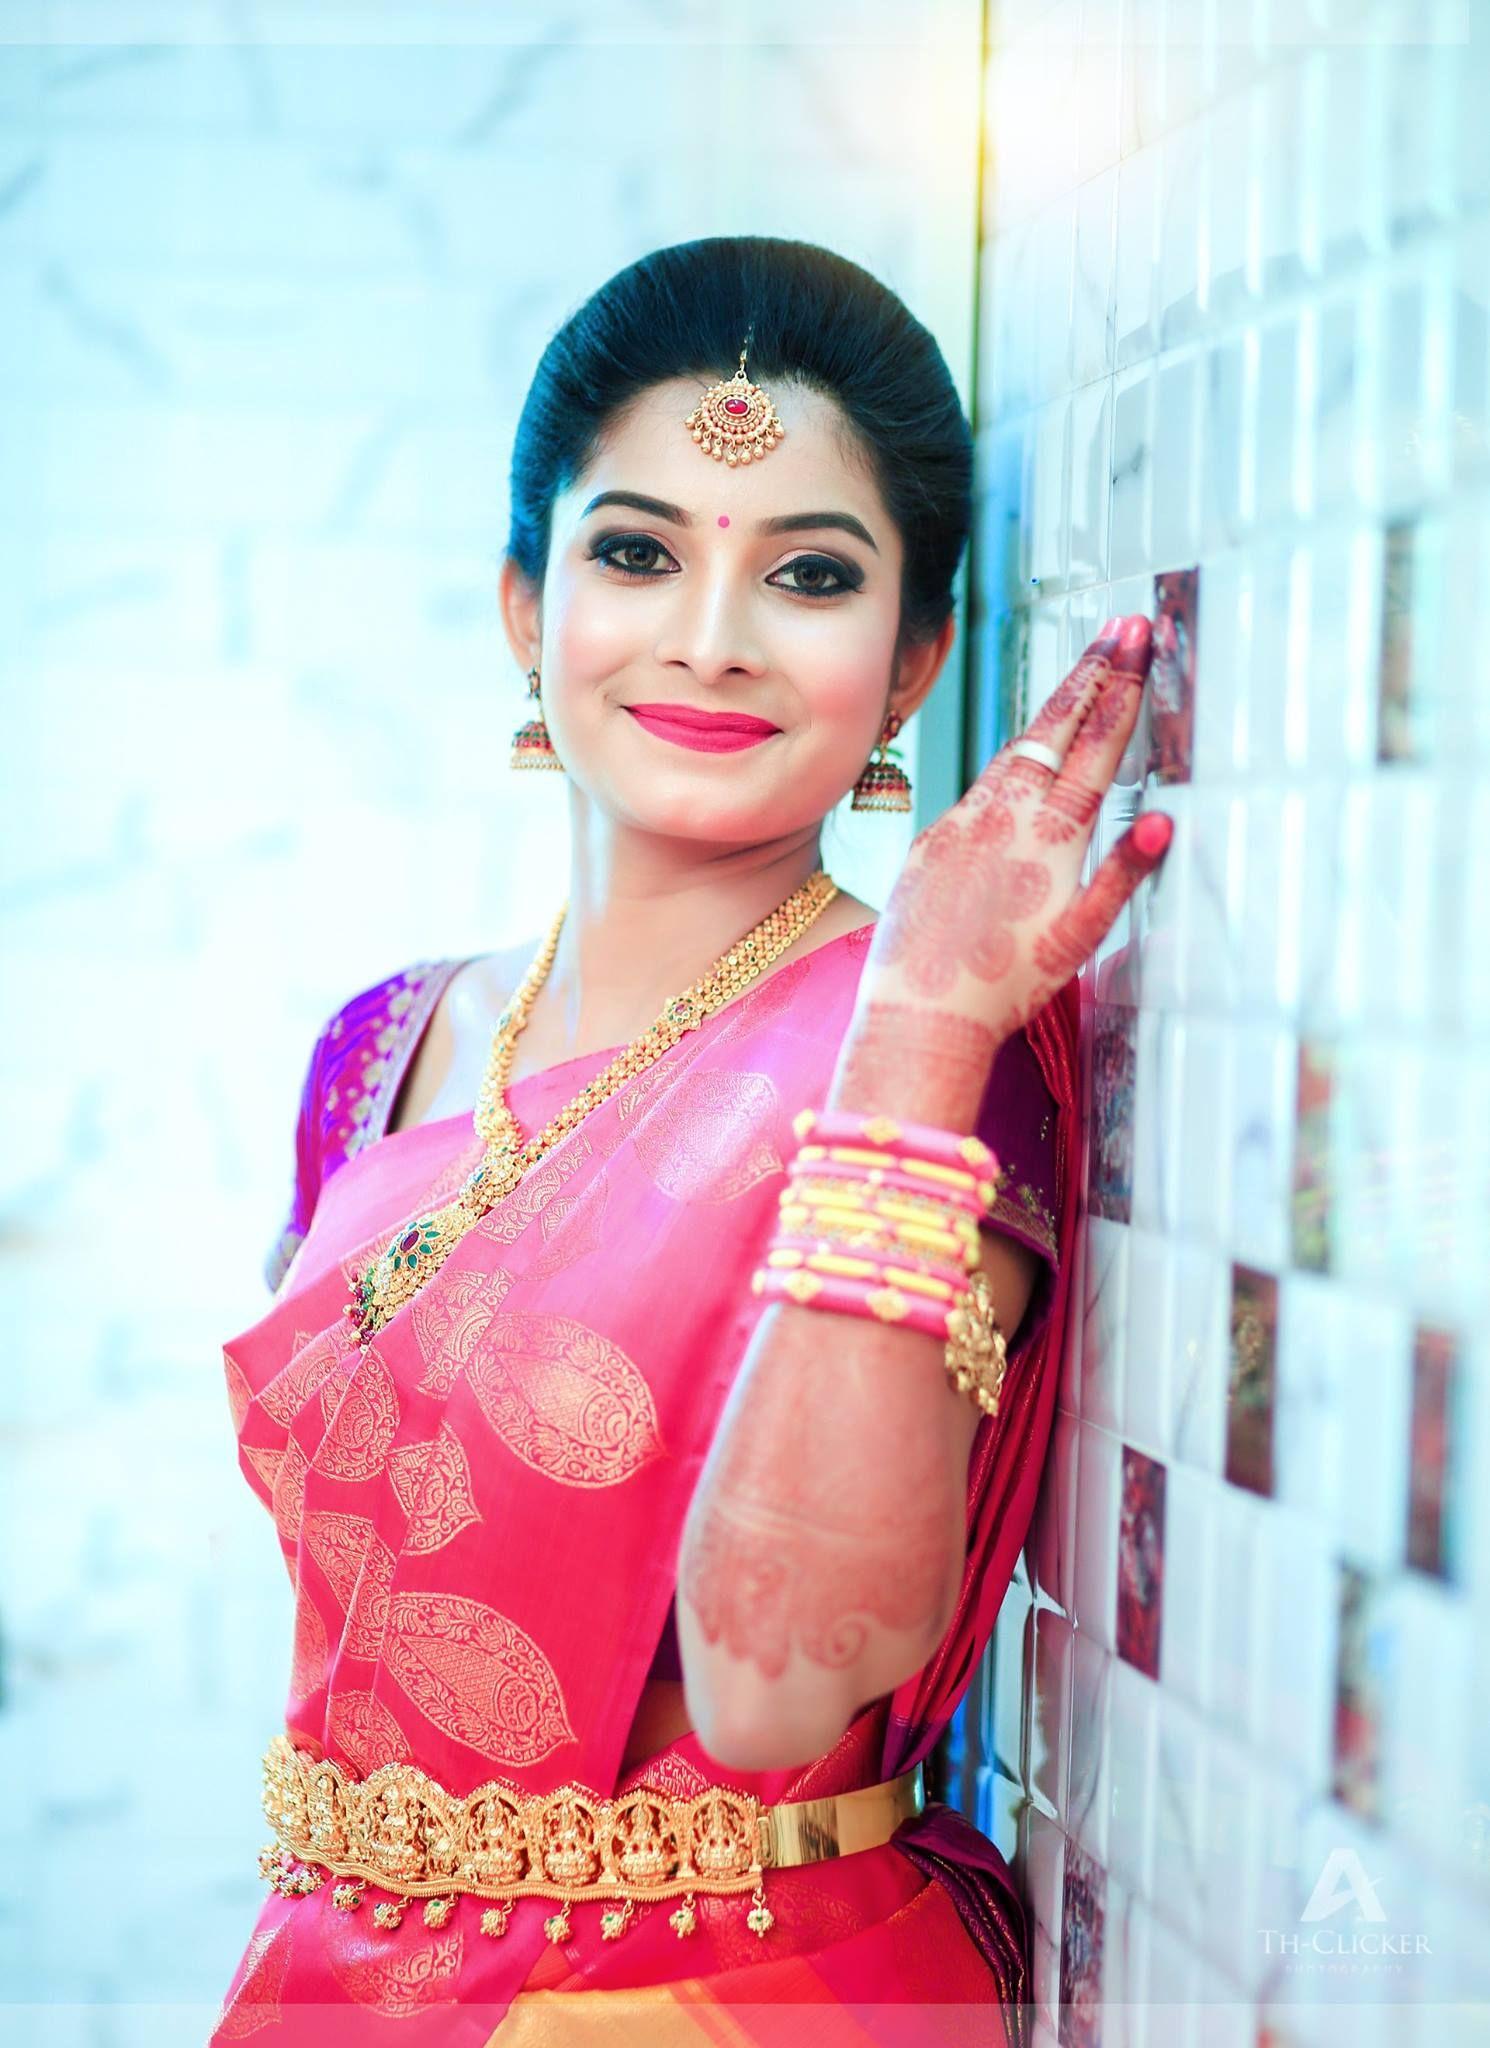 Wedding saree favz | south indian bride in 2018 | Pinterest ...